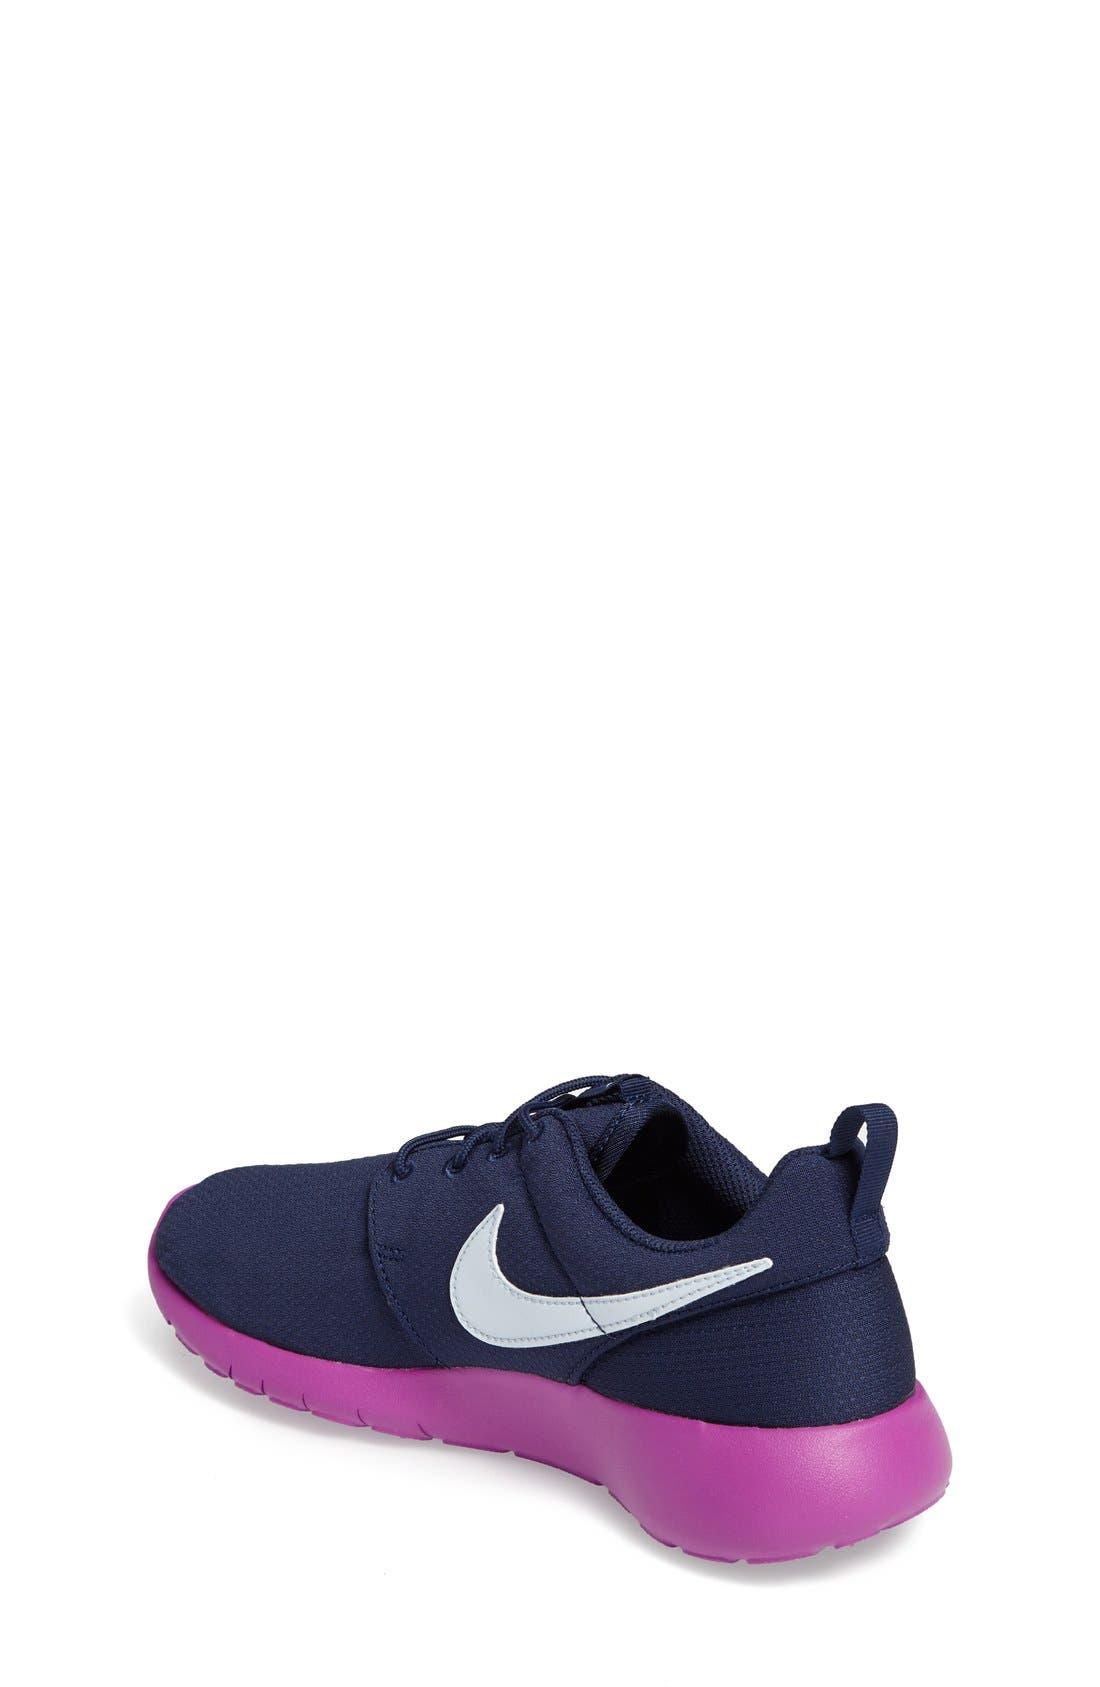 'Roshe Run' Athletic Shoe,                             Alternate thumbnail 264, color,